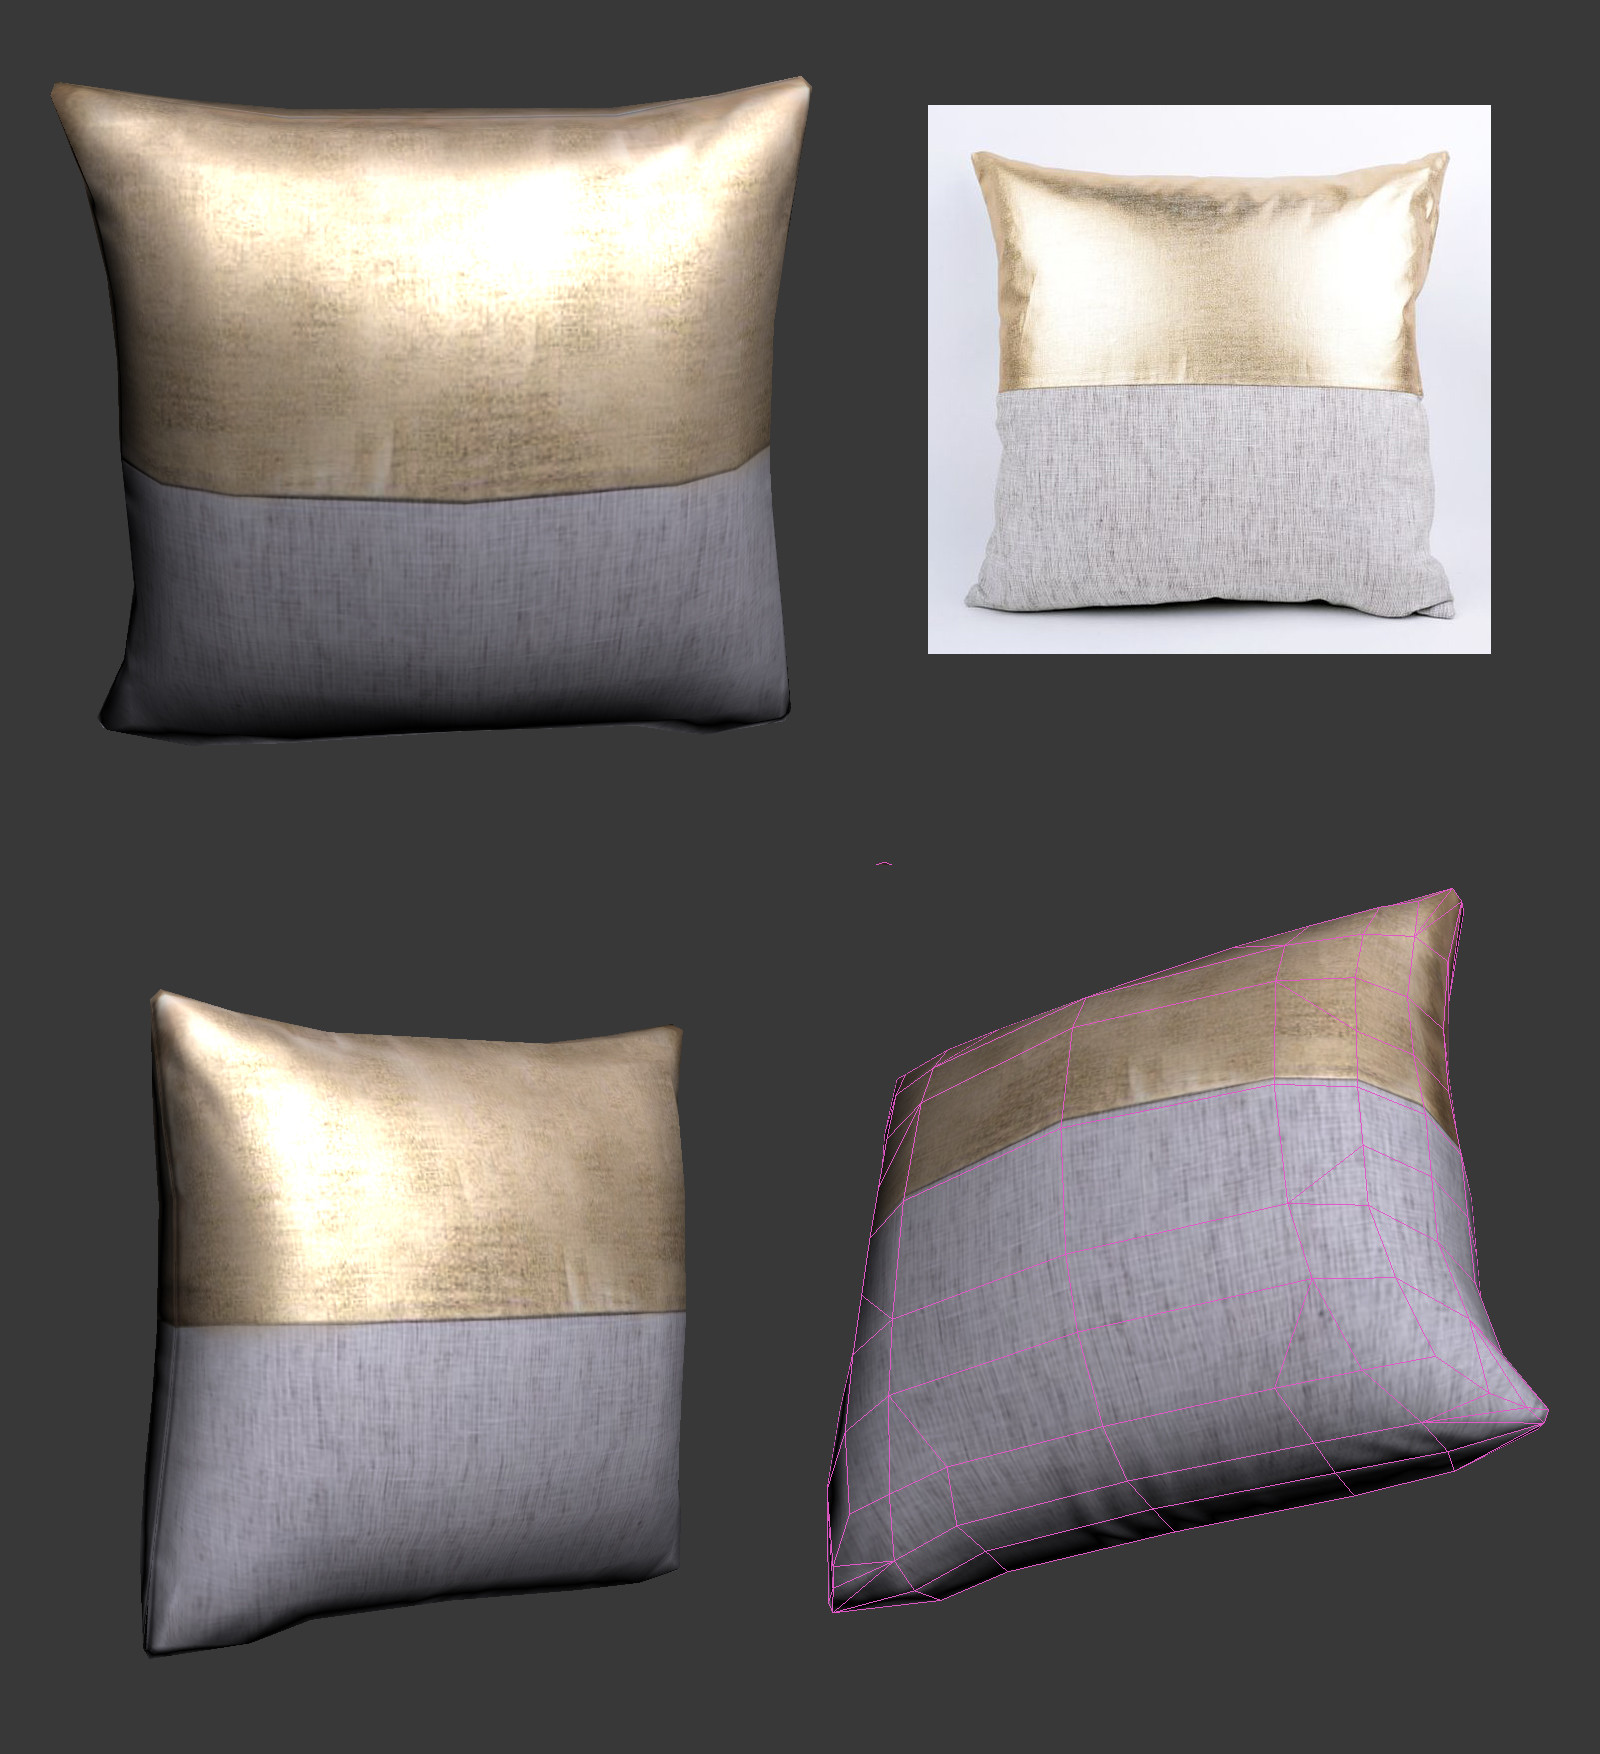 Oziel leal salinas pillow1 2